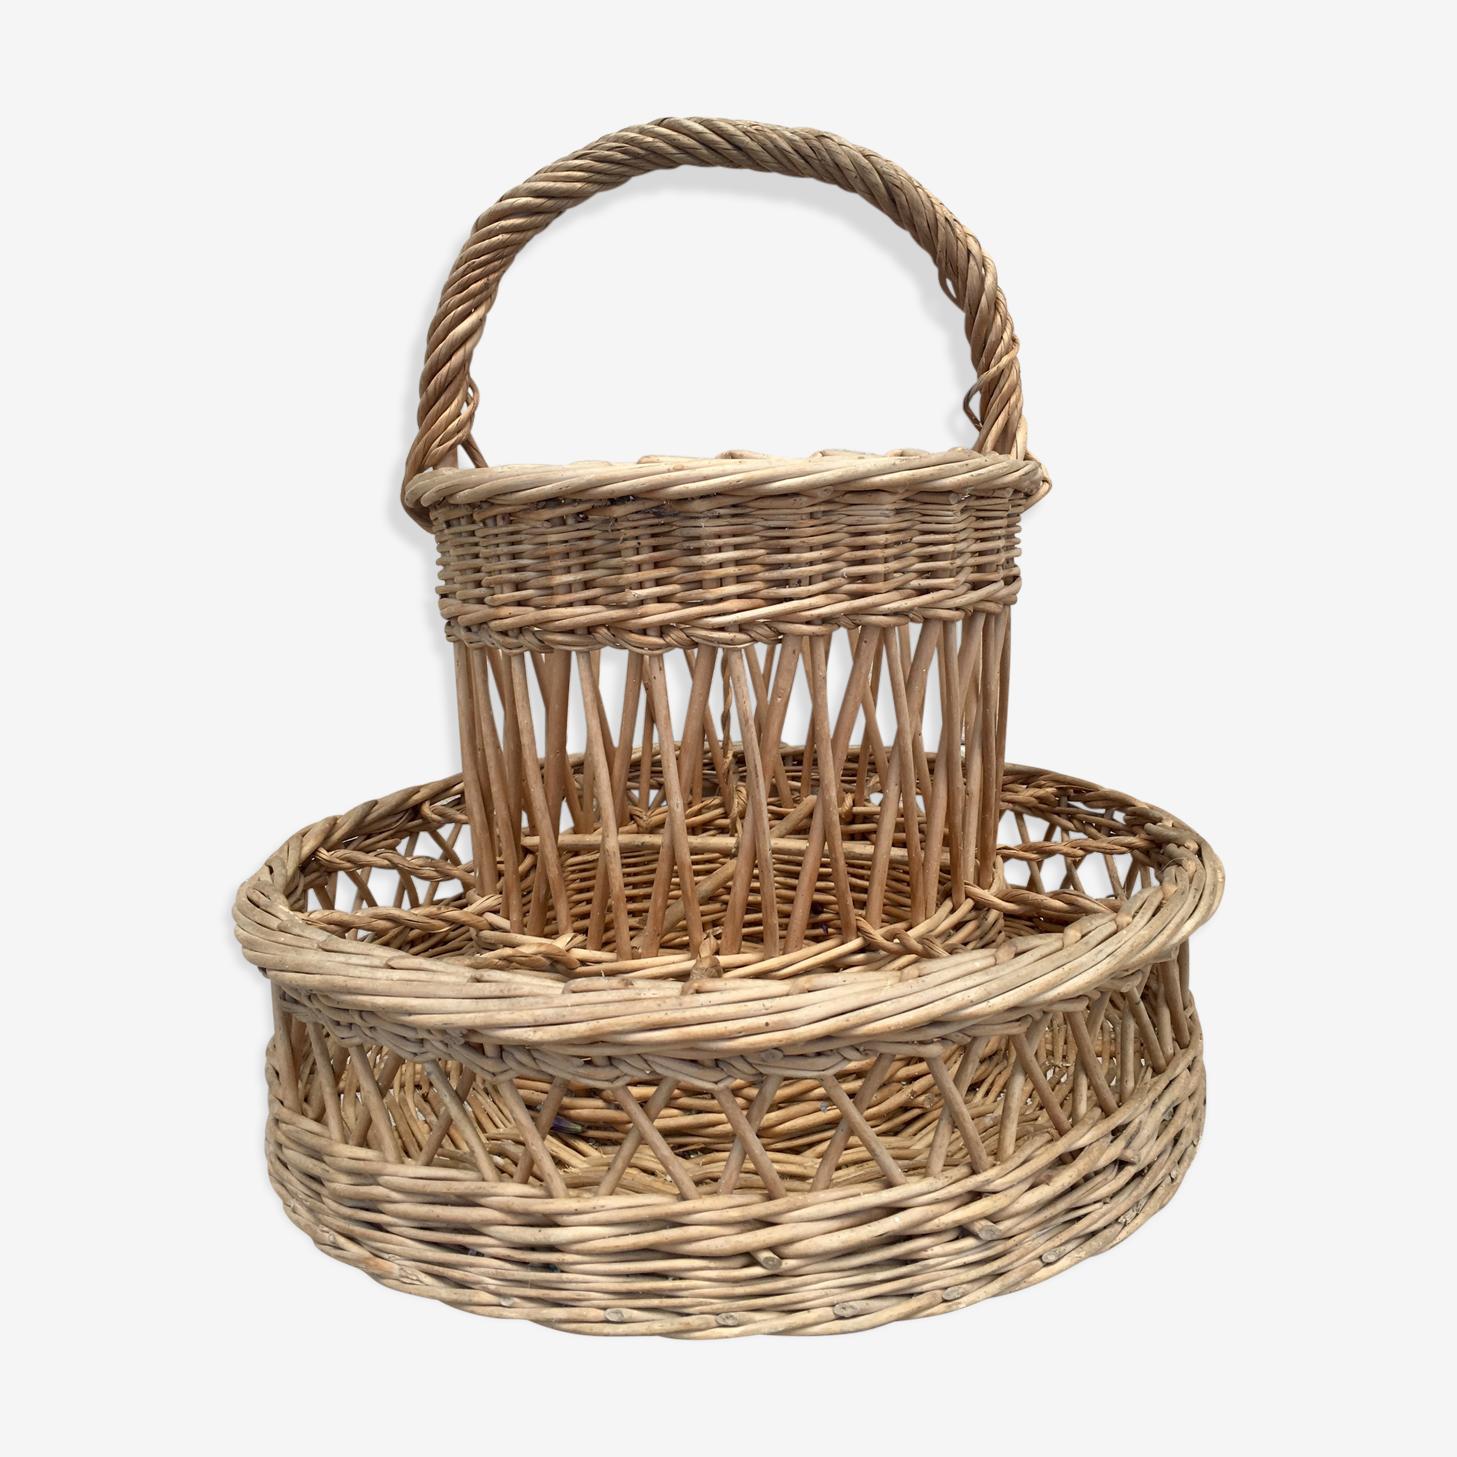 Vintage braided wicker basket-bar